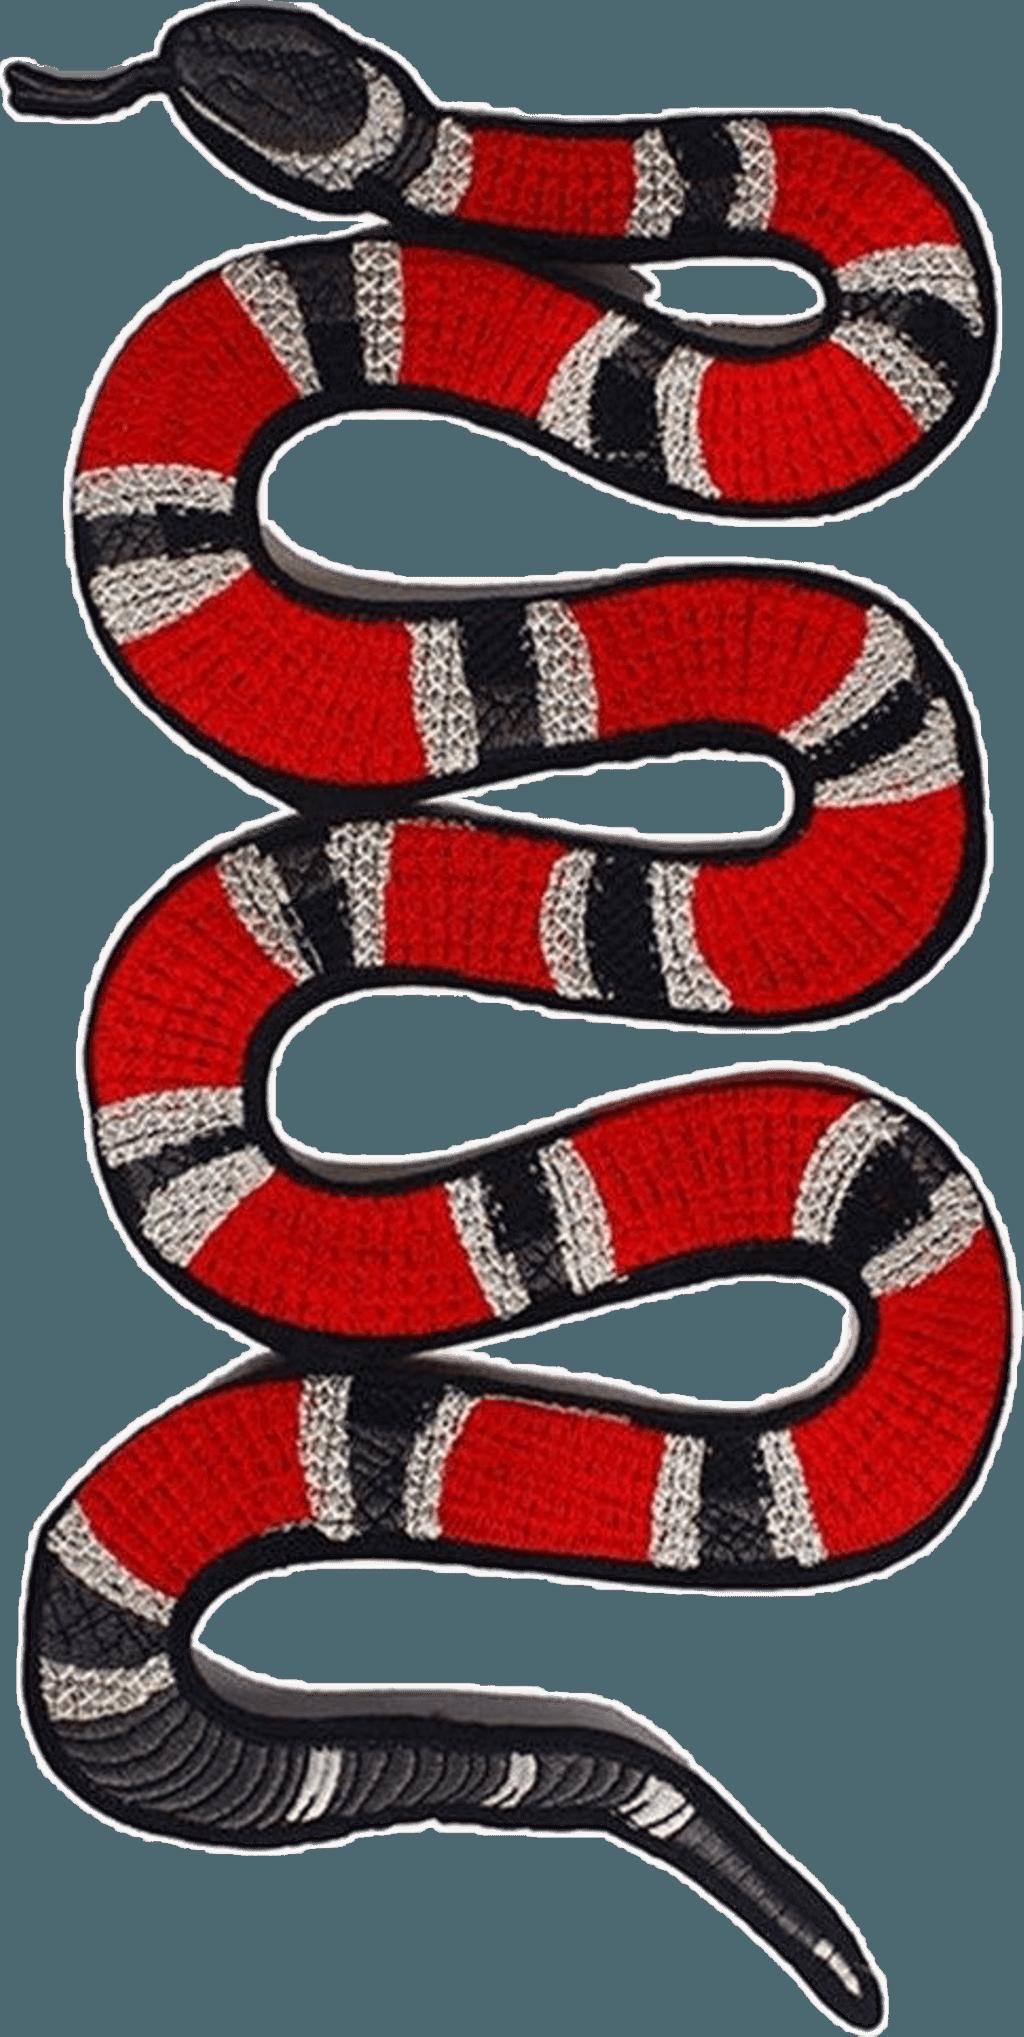 Coral Snake Gucci Logo , LogoDix